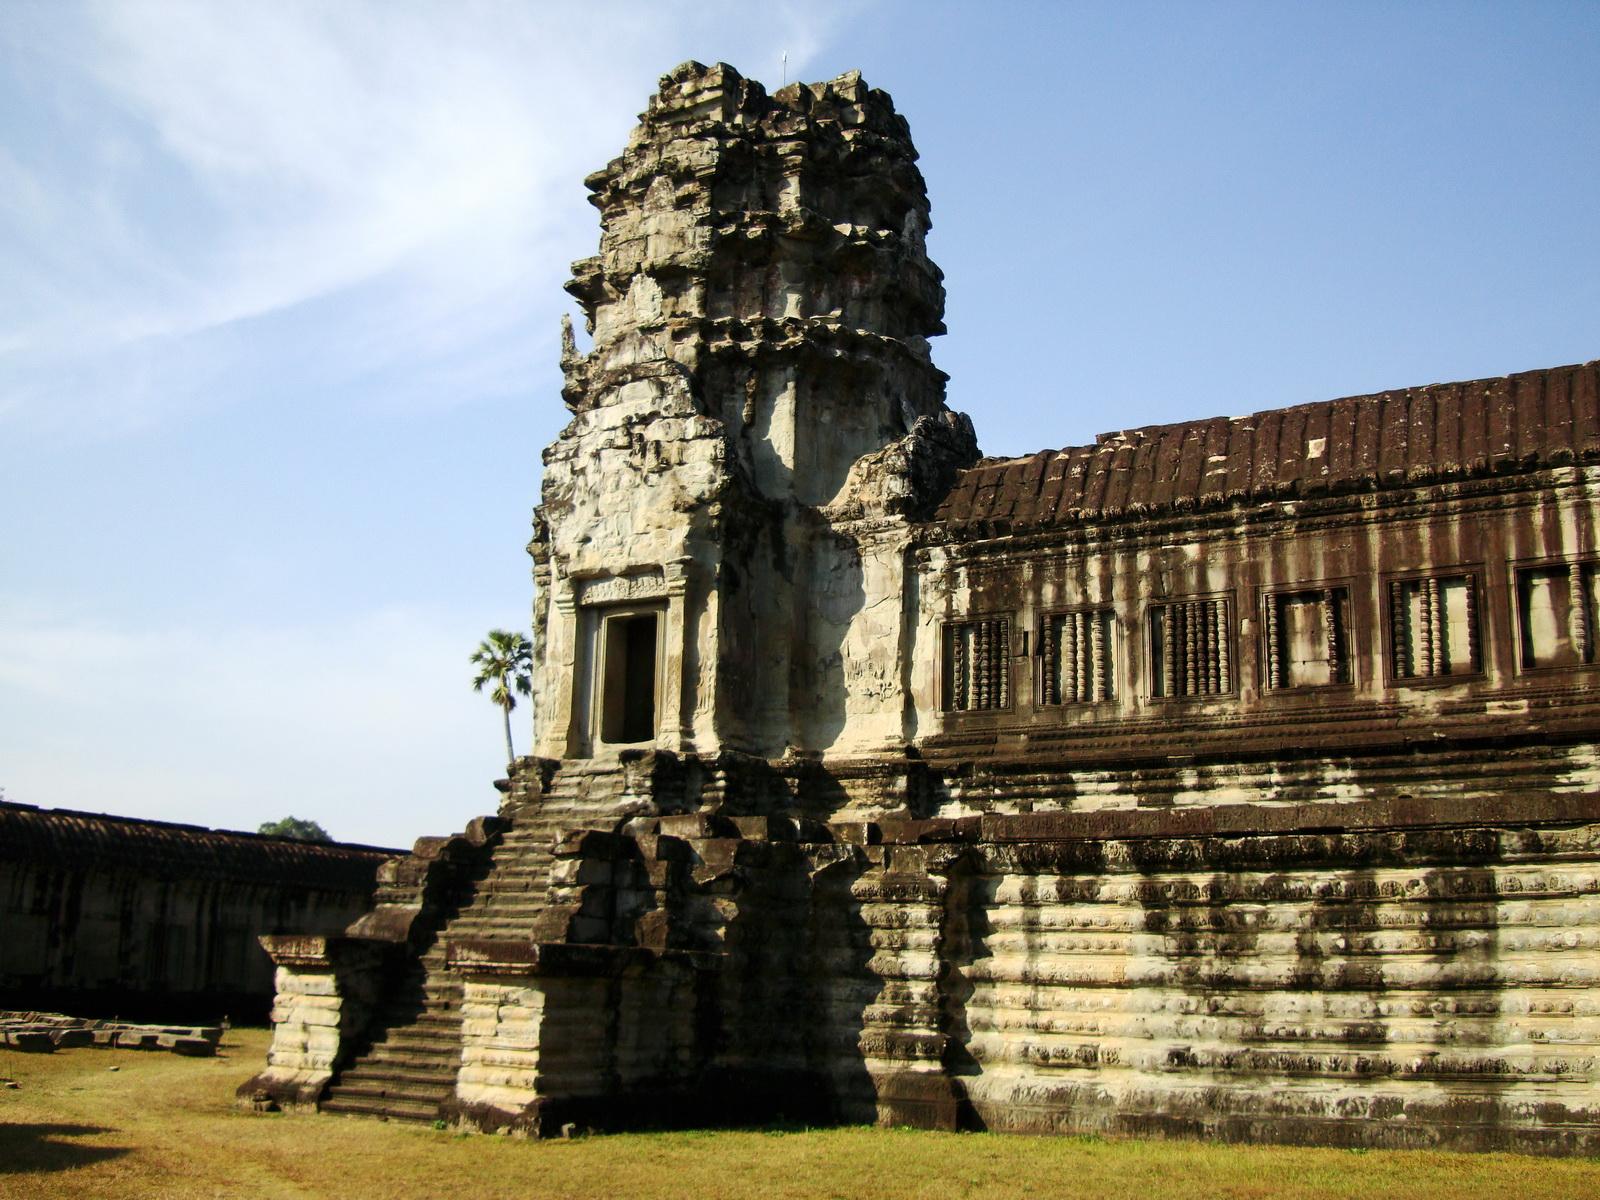 Angkor Wat Khmer architecture internal gallery E entrance 06